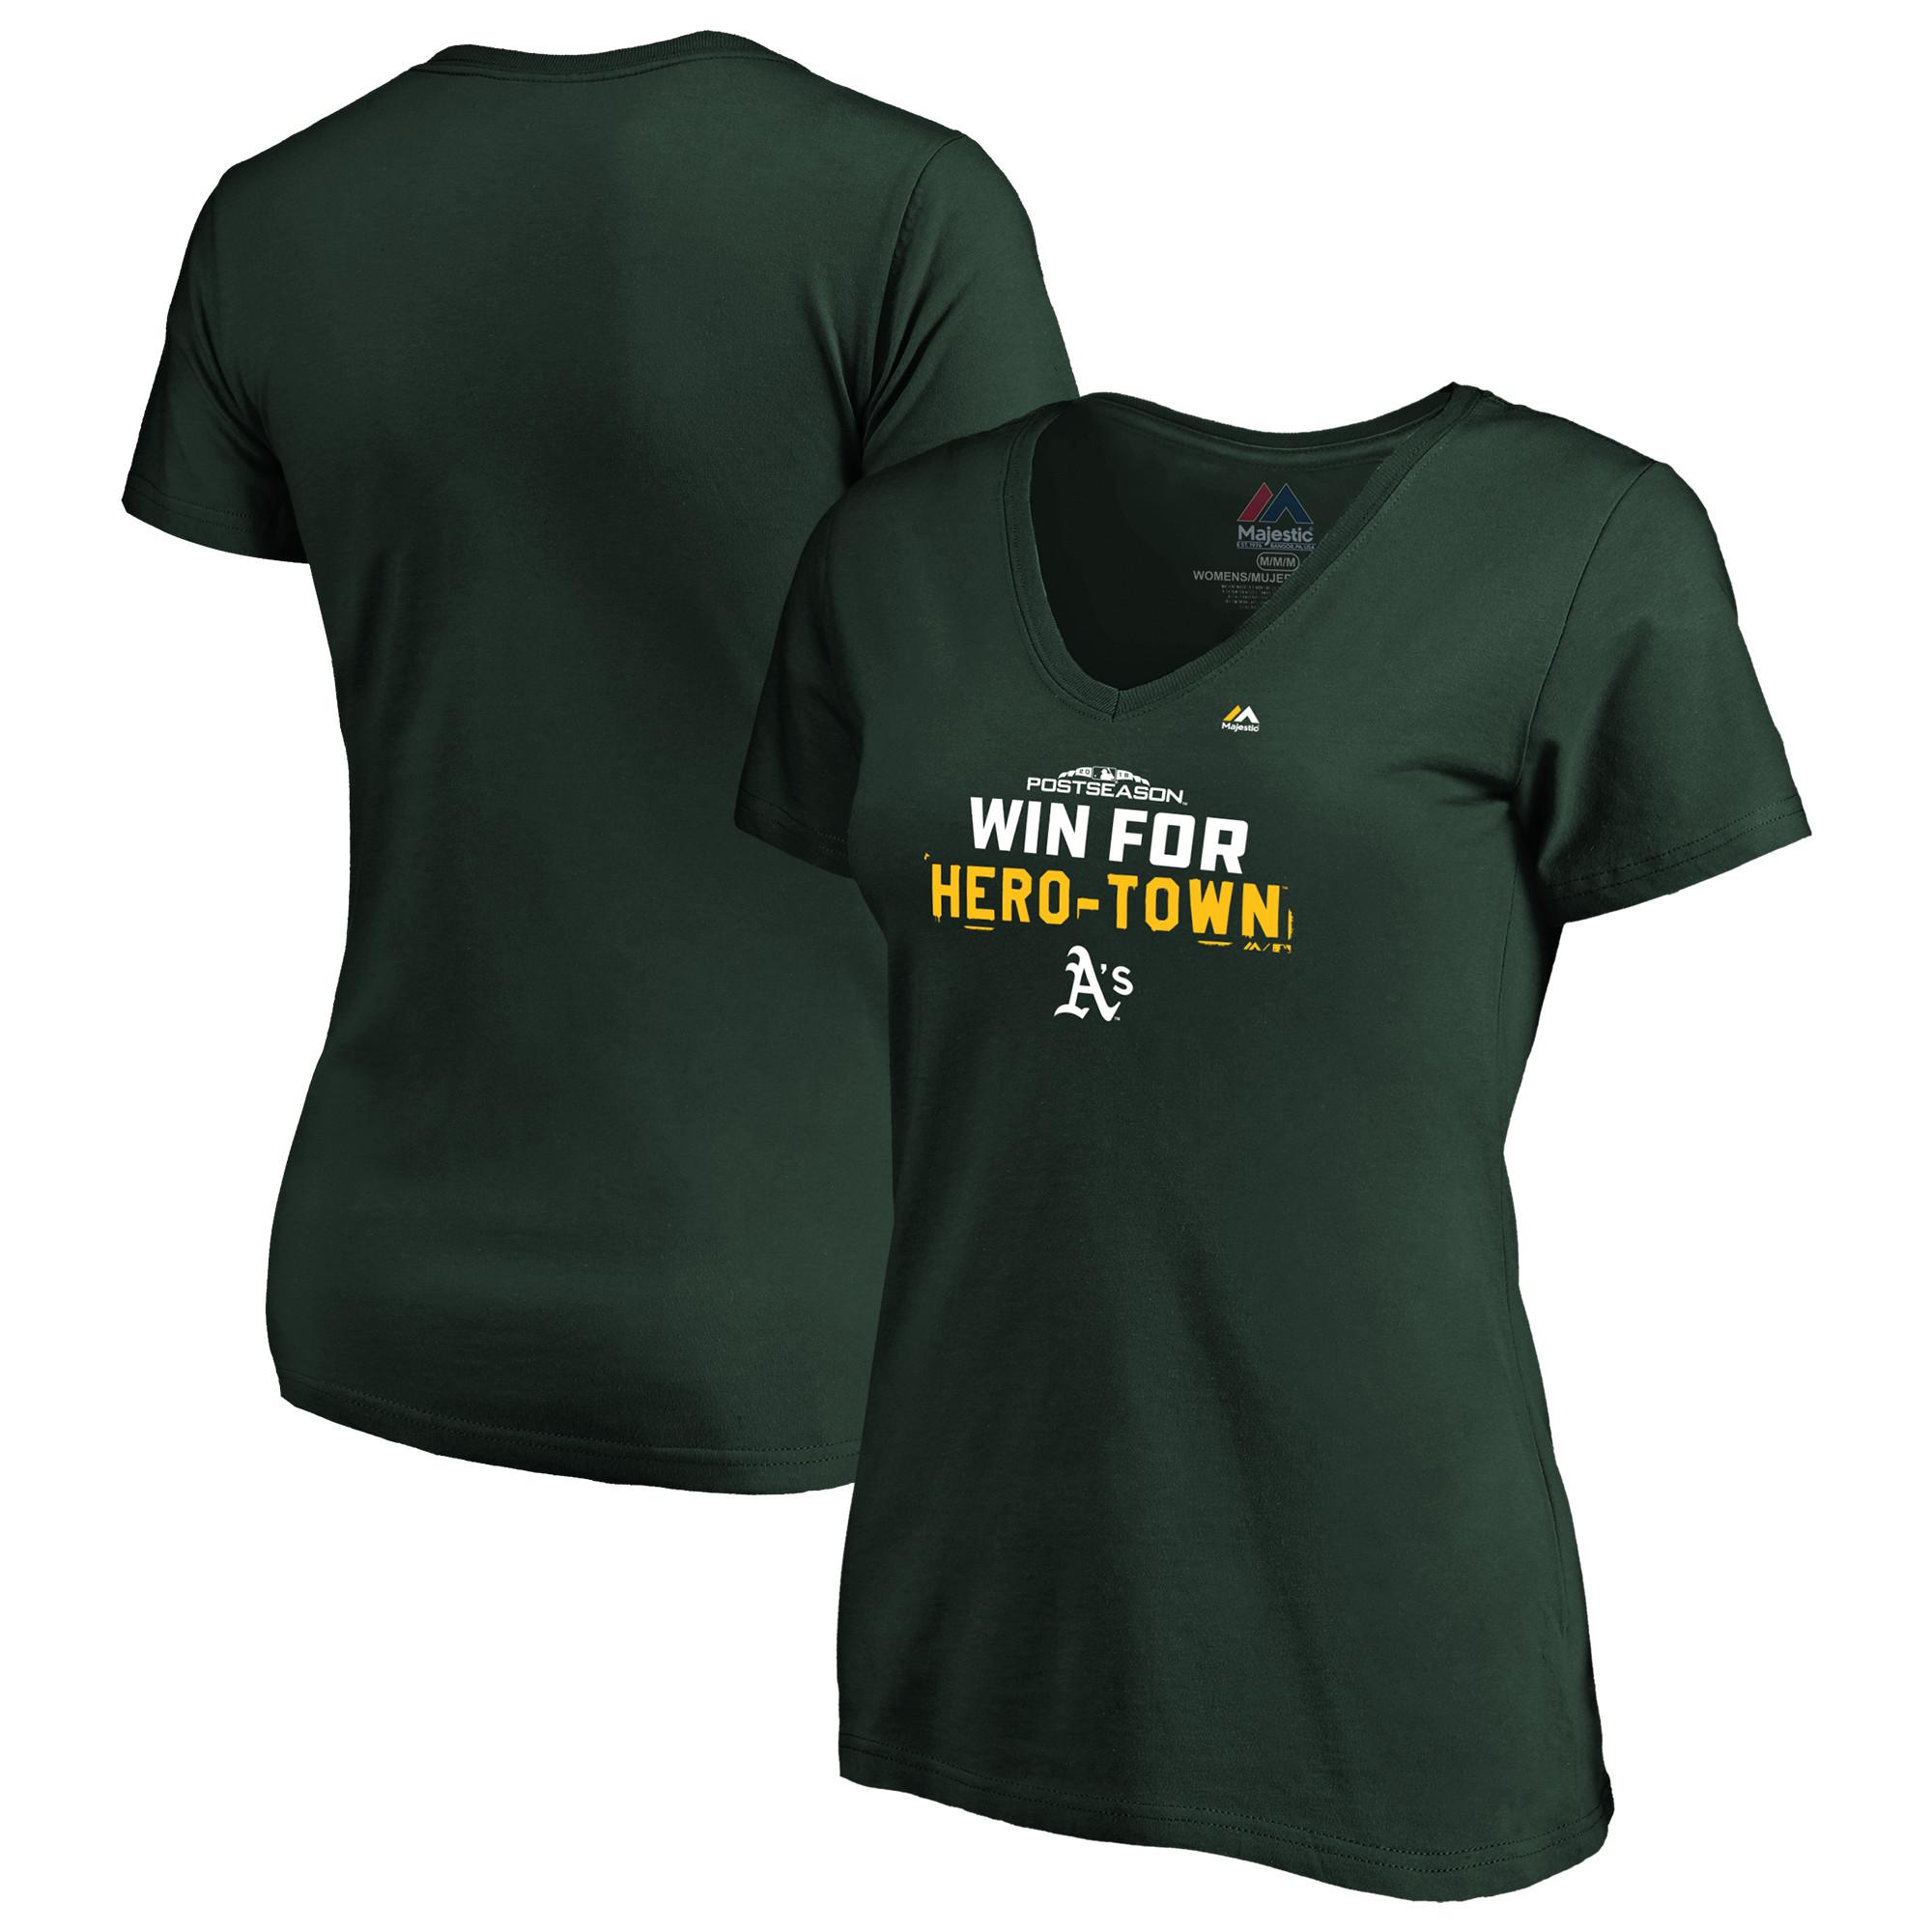 Oakland Athletics Majestic Women's 2018 Postseason Authentic Collection V-Neck T-Shirt - Green